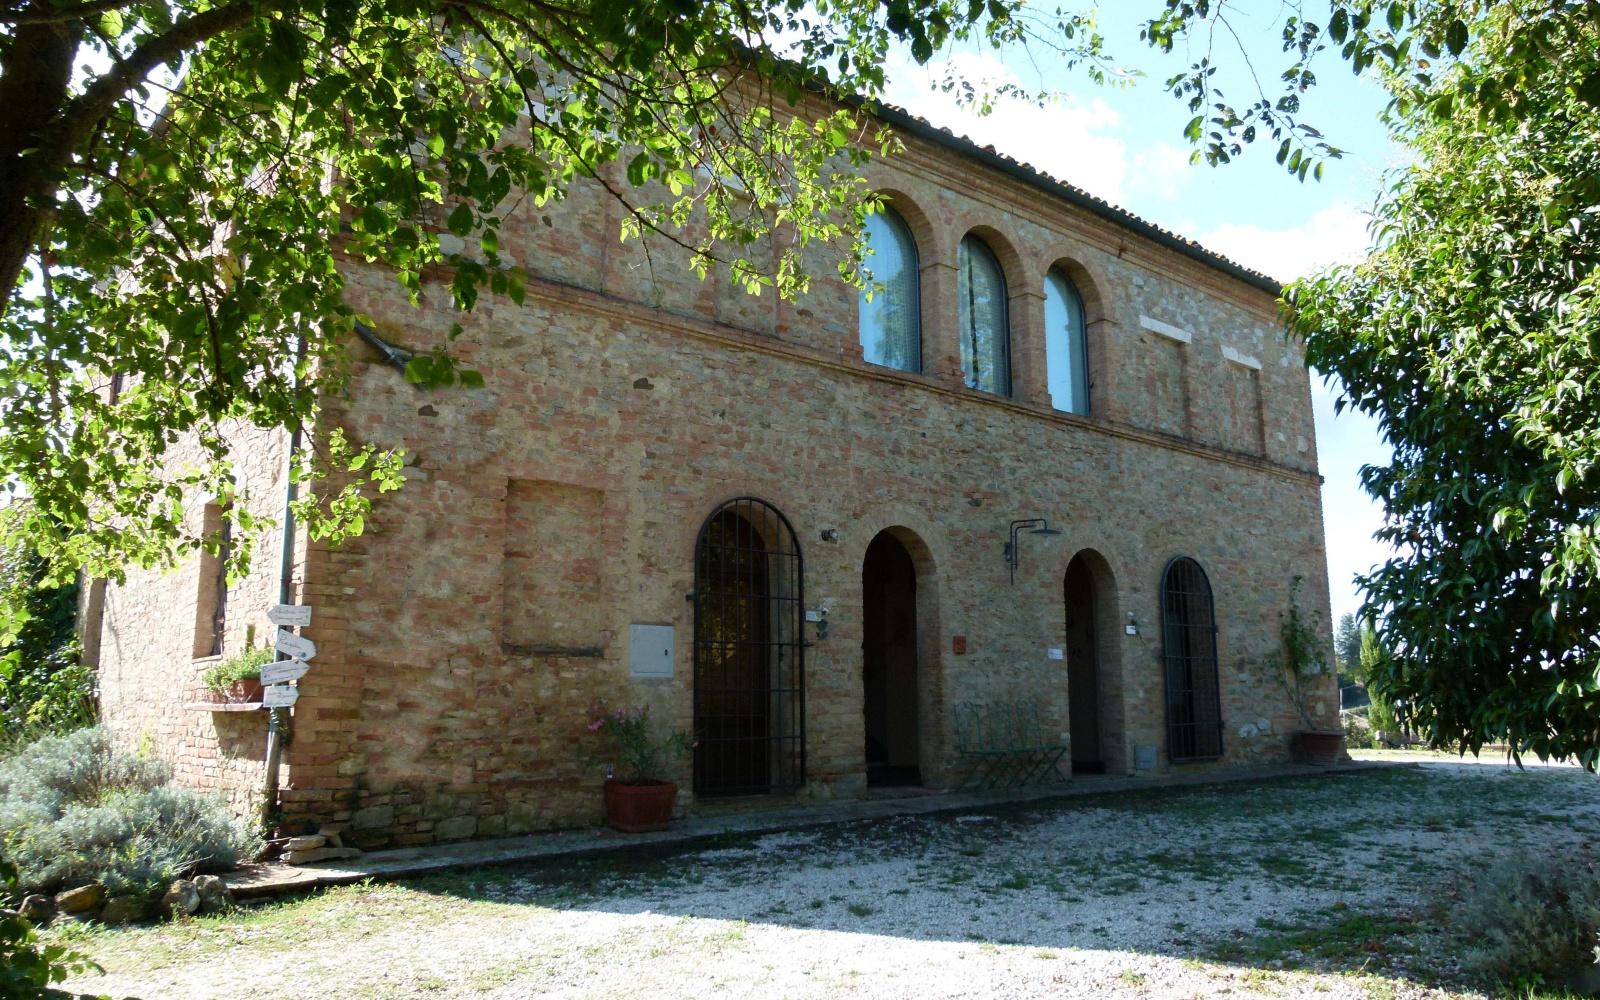 Buonconvento, Siena, Toscana, Italia, 8 Bedrooms Bedrooms, 15 Rooms Rooms,7 BathroomsBathrooms,Ville e casali,In vendita,1121